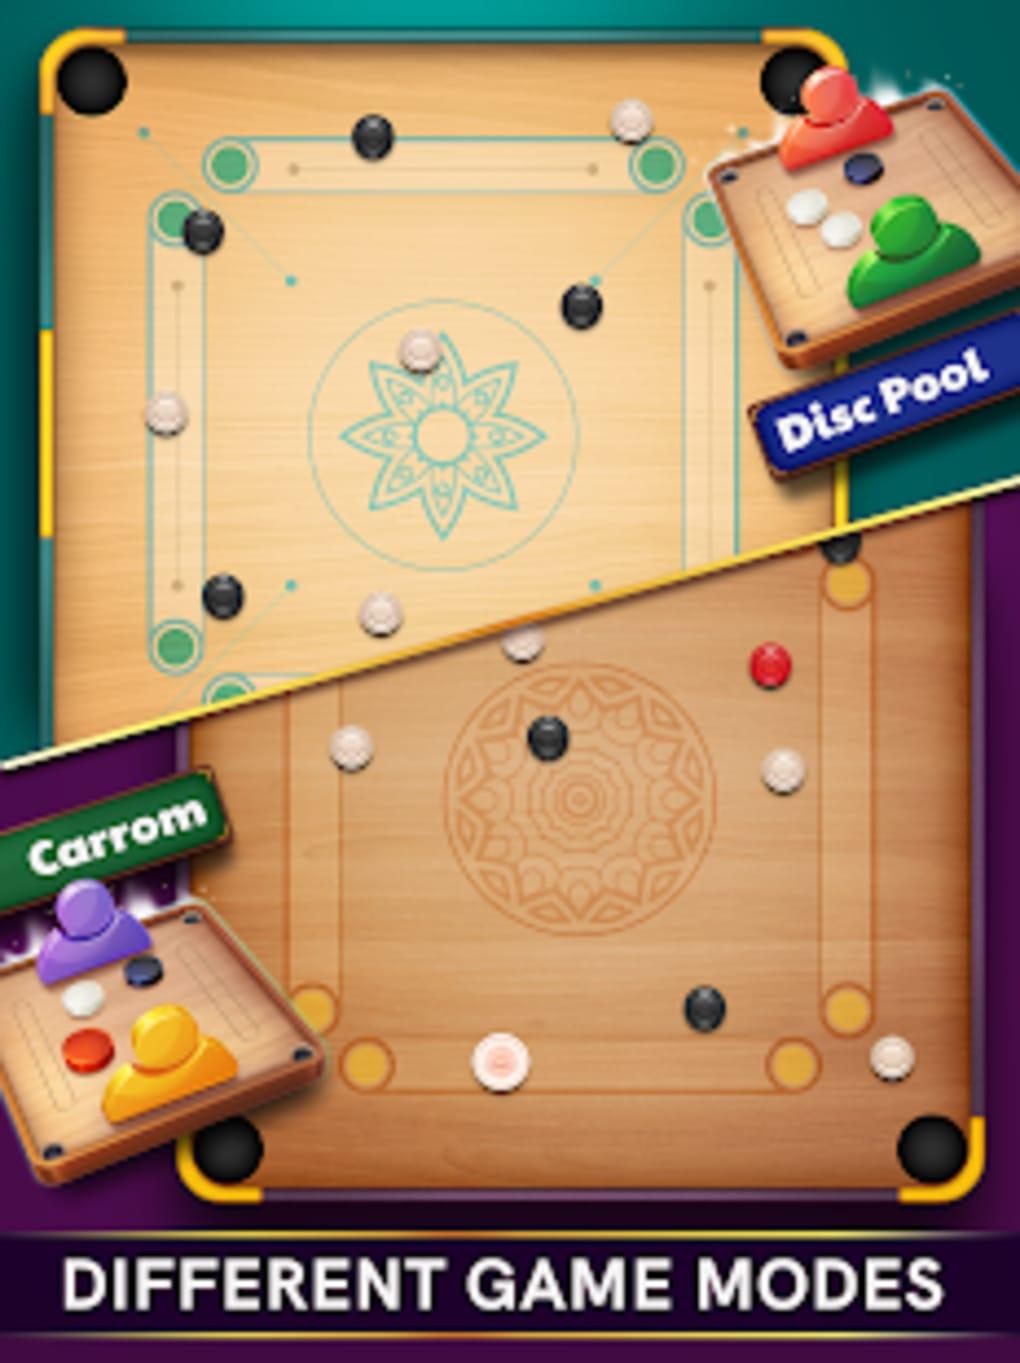 Carrom betting app games